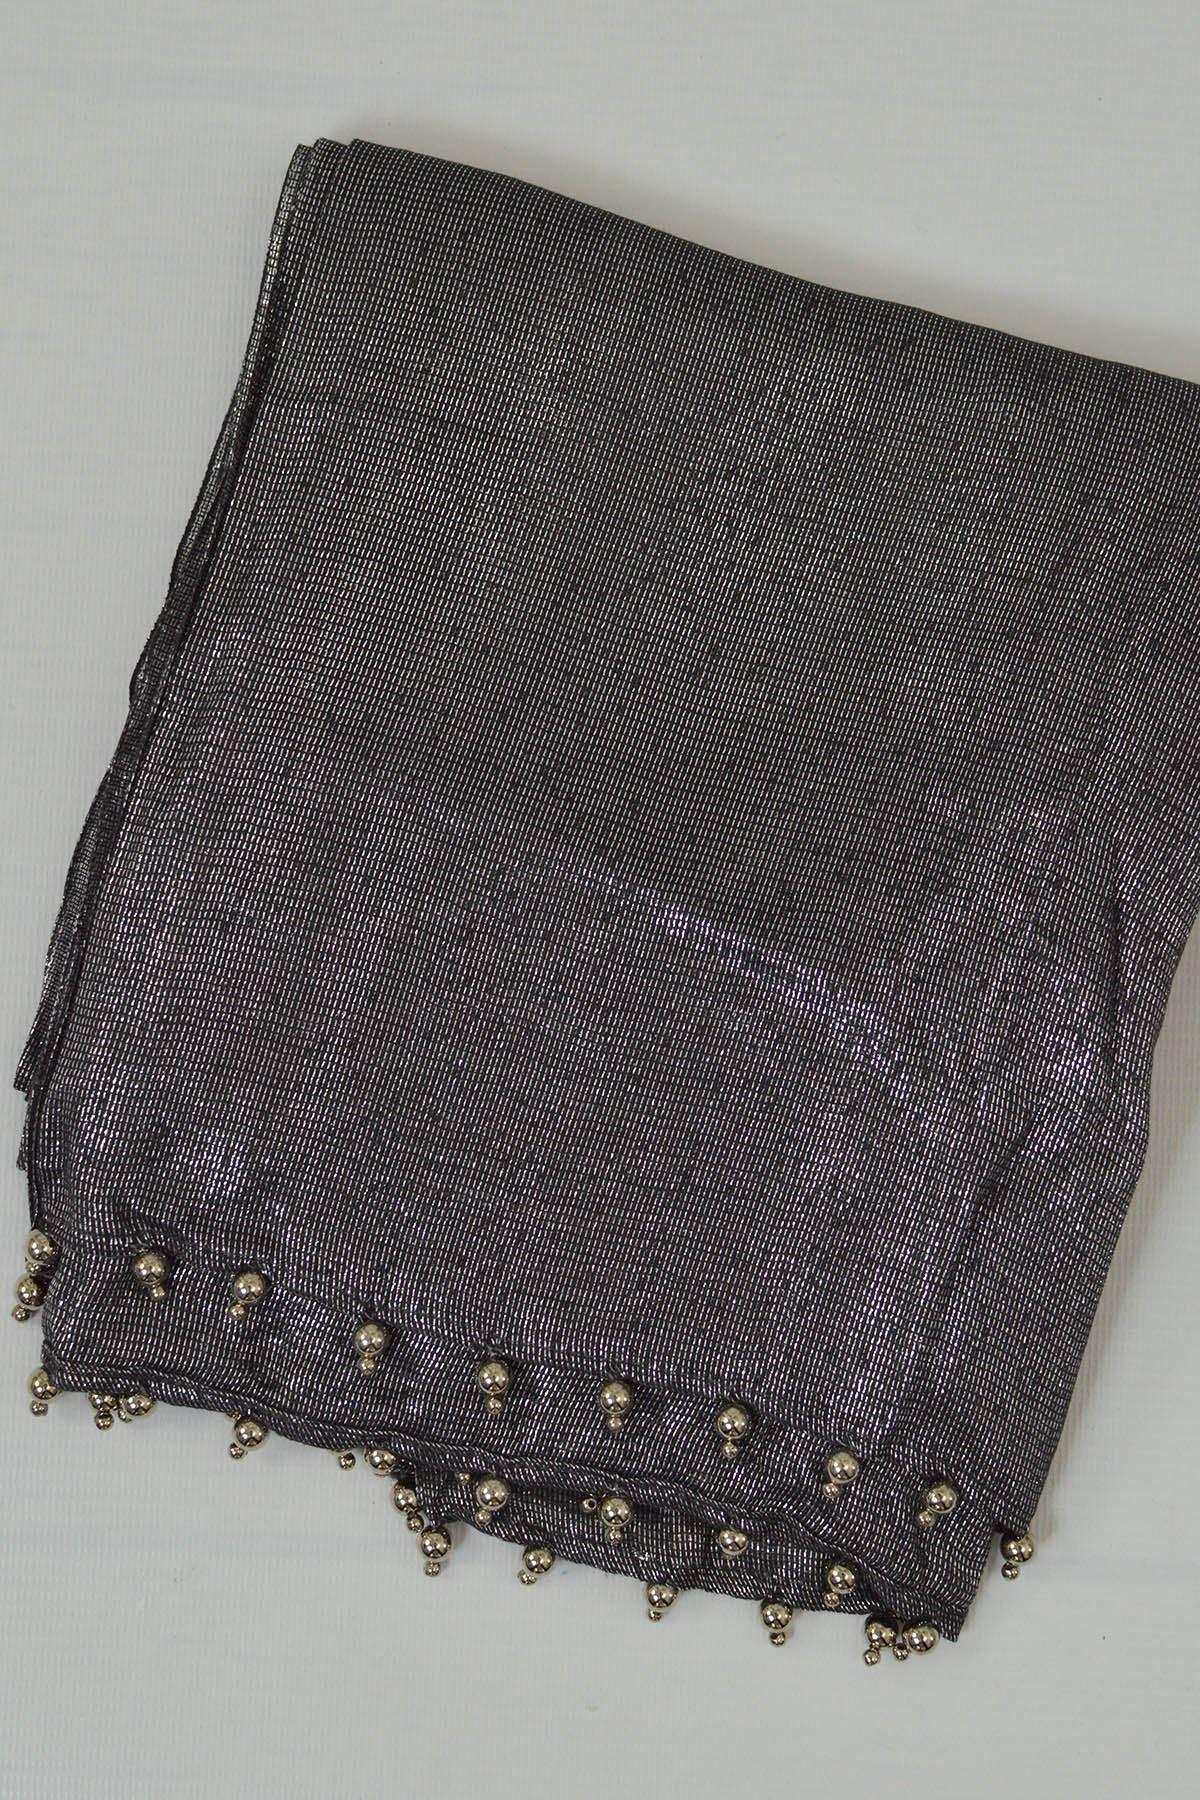 Lurex Thread Weave Beaded Tassle Edge Scarf Pashmina Silver Gold